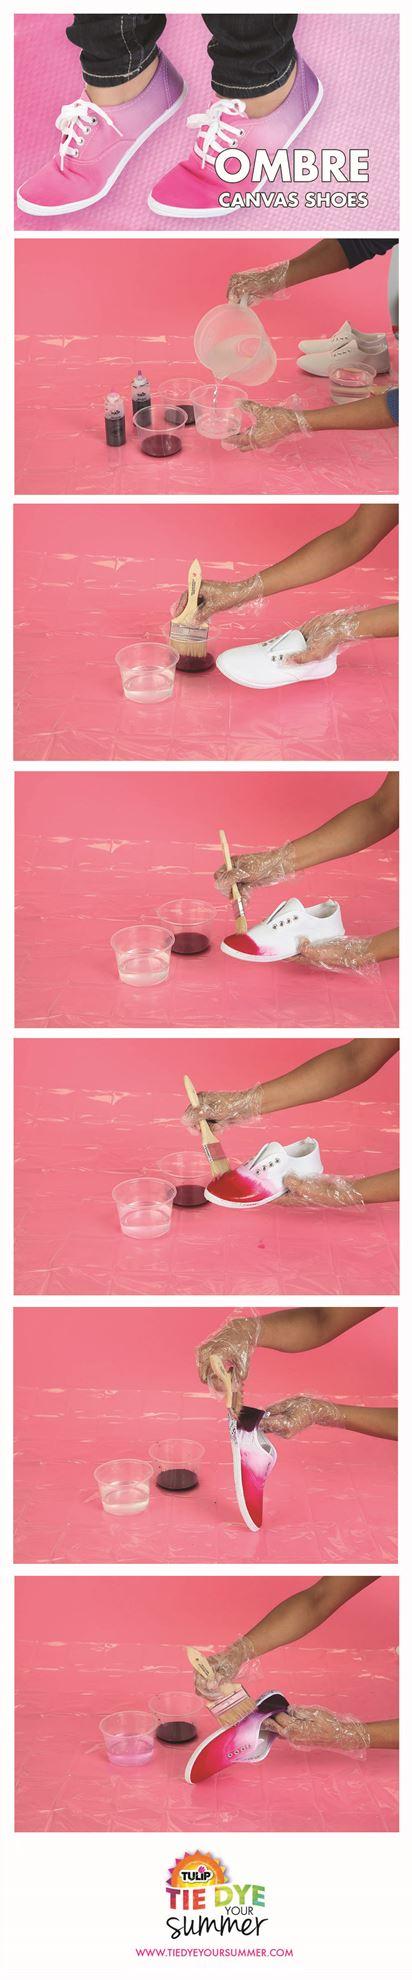 #tiedye #ombretechnique #tiedyeshoes #tdys #tiedyeyoursummer #tuliptiedye #TDYS